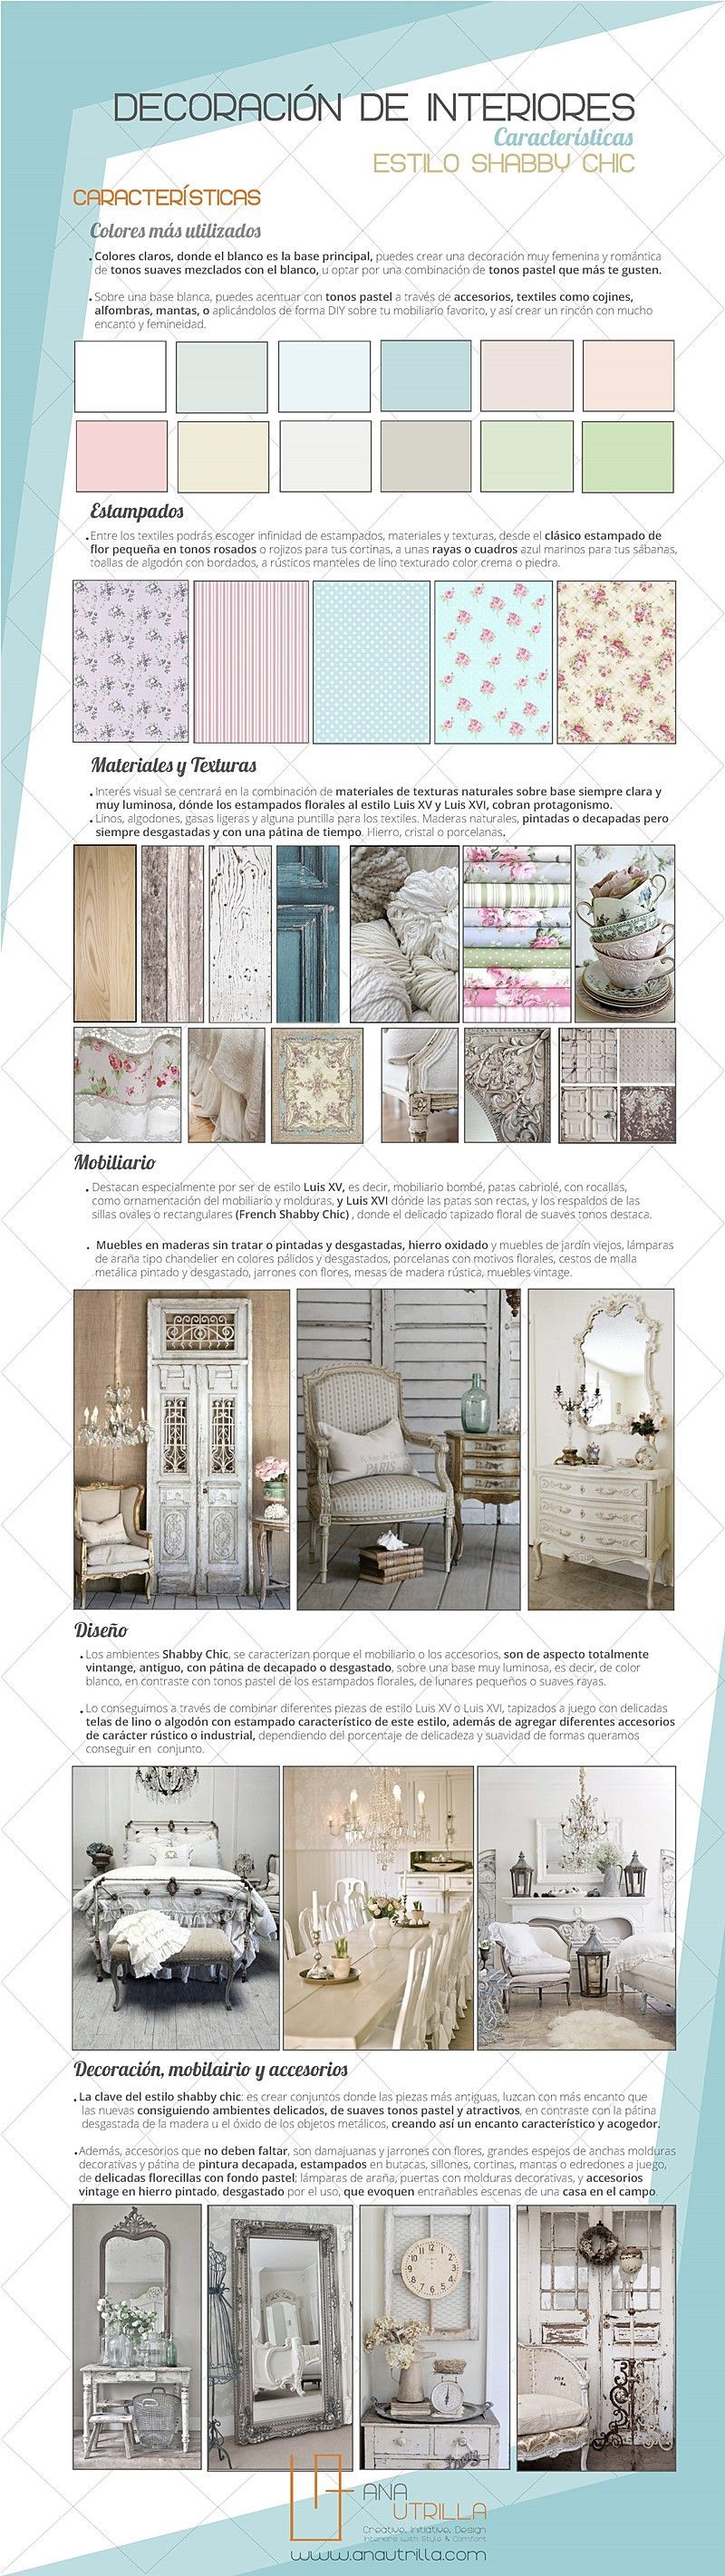 Infografía estilo shabby chic en decoración de interiores por Ana Utrilla